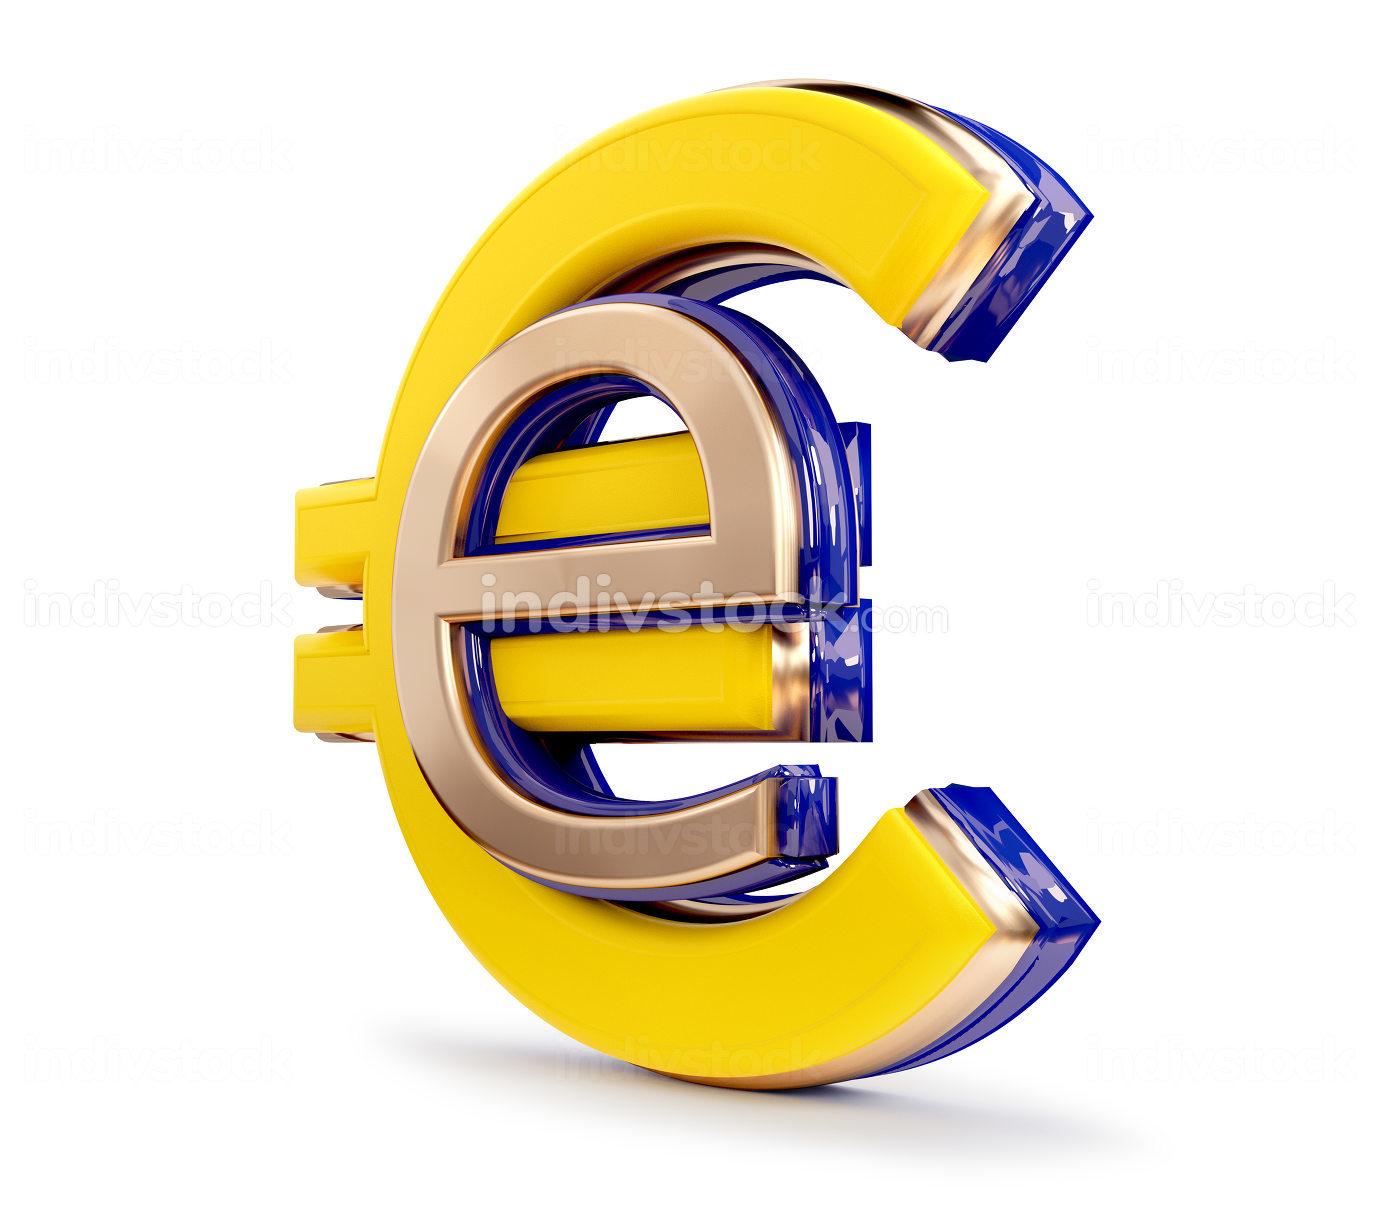 digital currency symbolic E-Euro design 3d-illustration